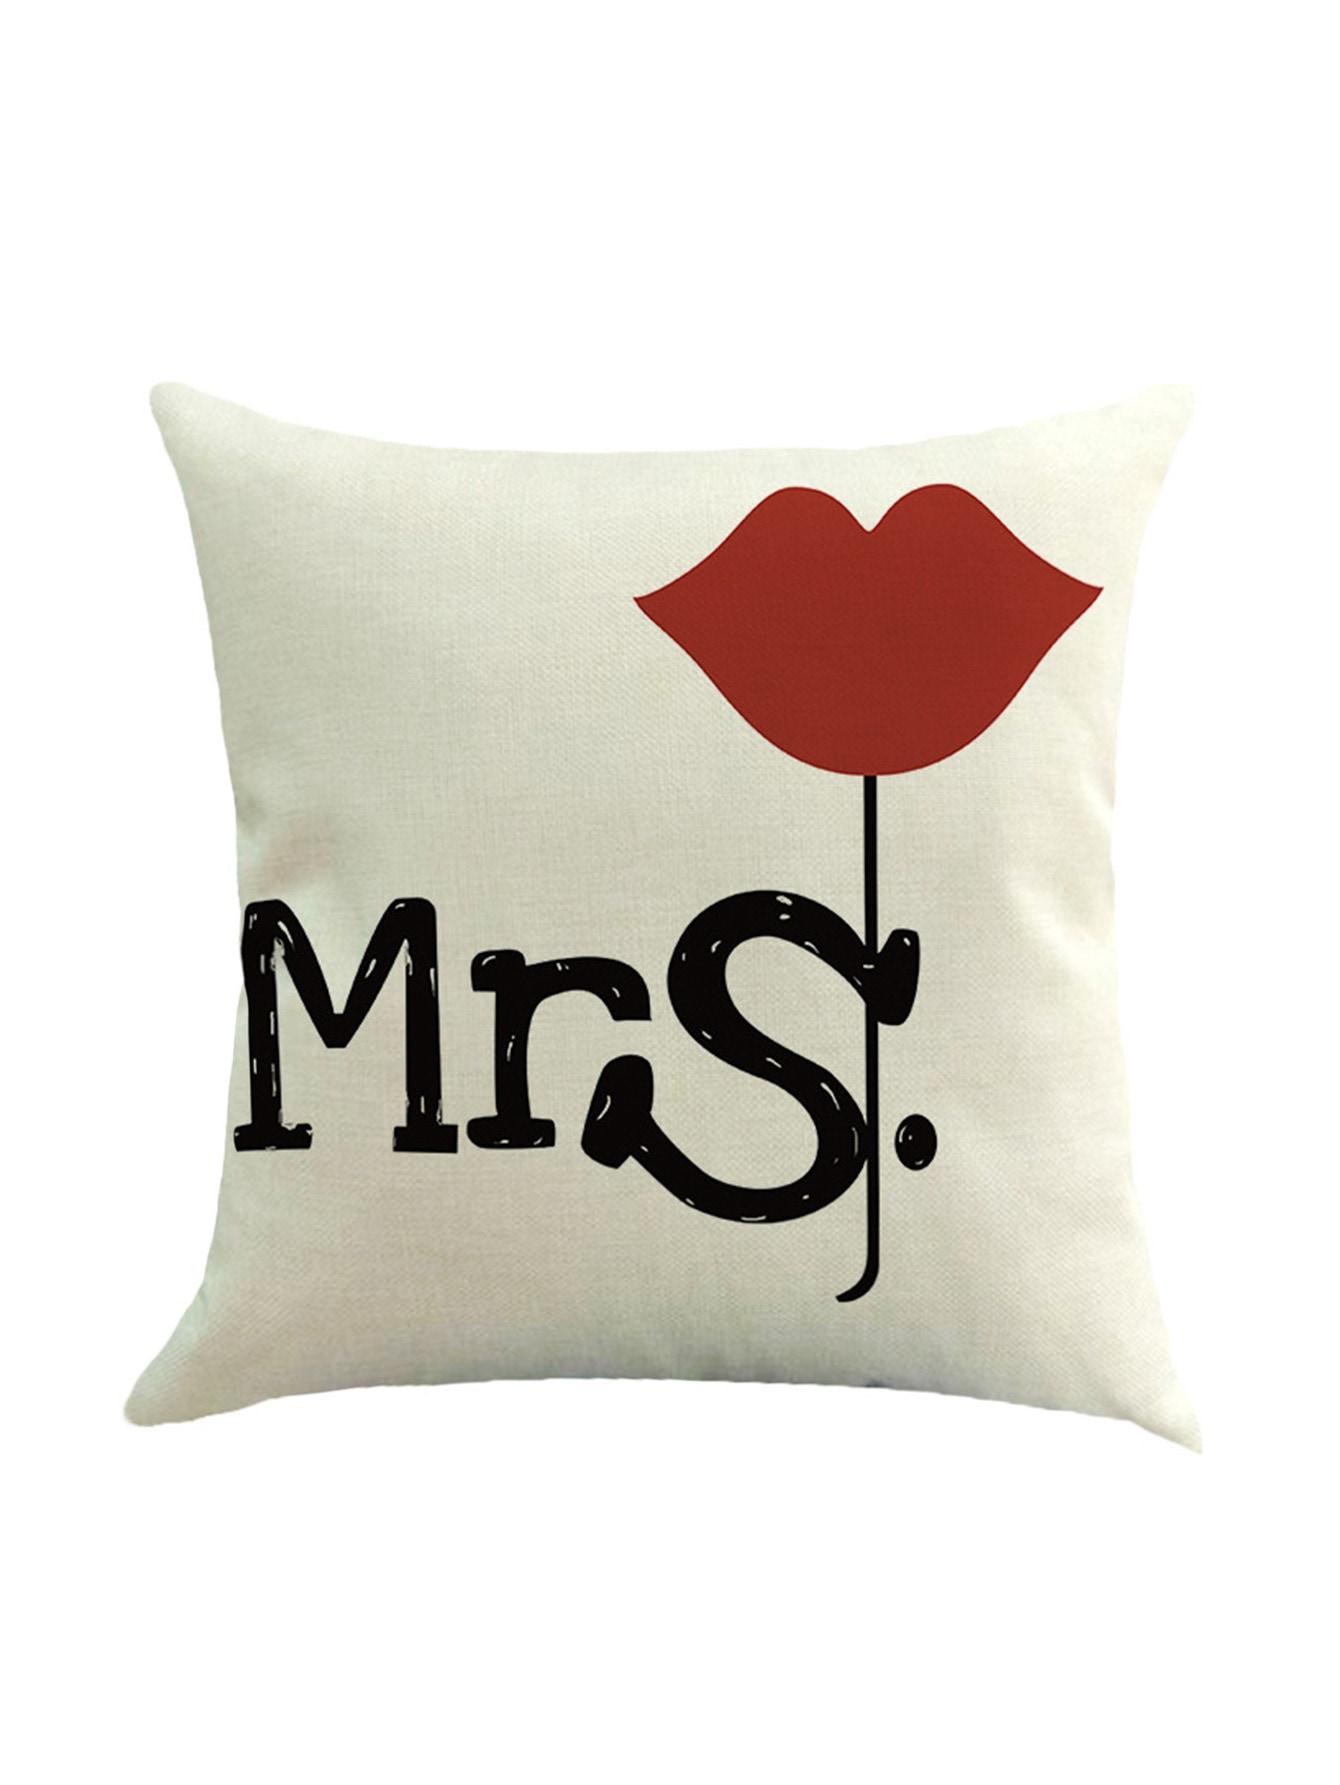 White Cute Couple Pillowcase Cover